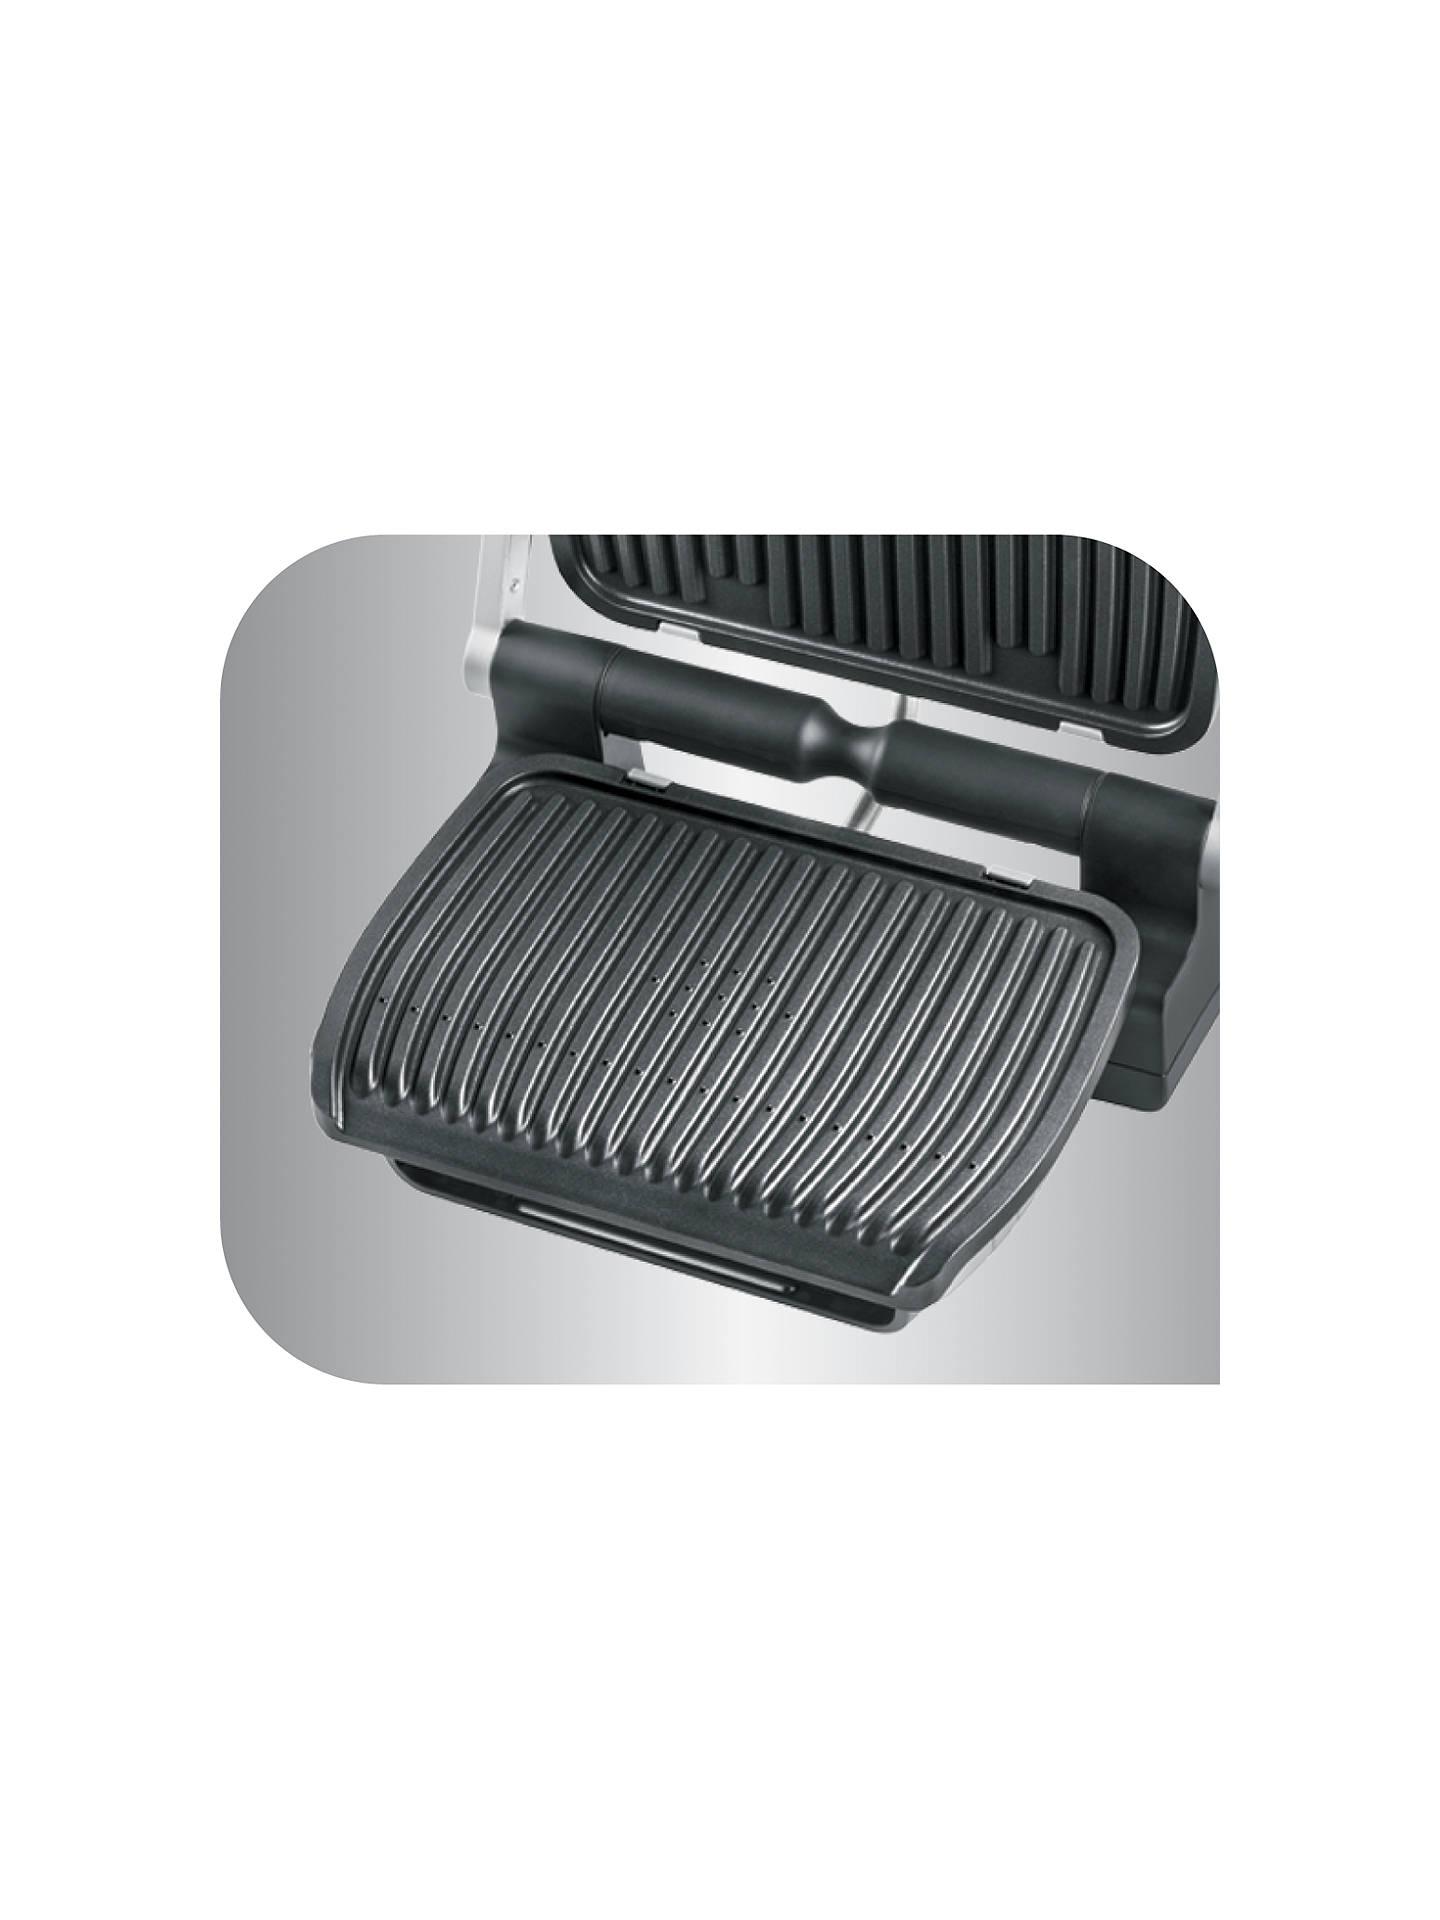 Tefal gc713d40 optigrill at john lewis partners - Tefal raclette grill john lewis ...